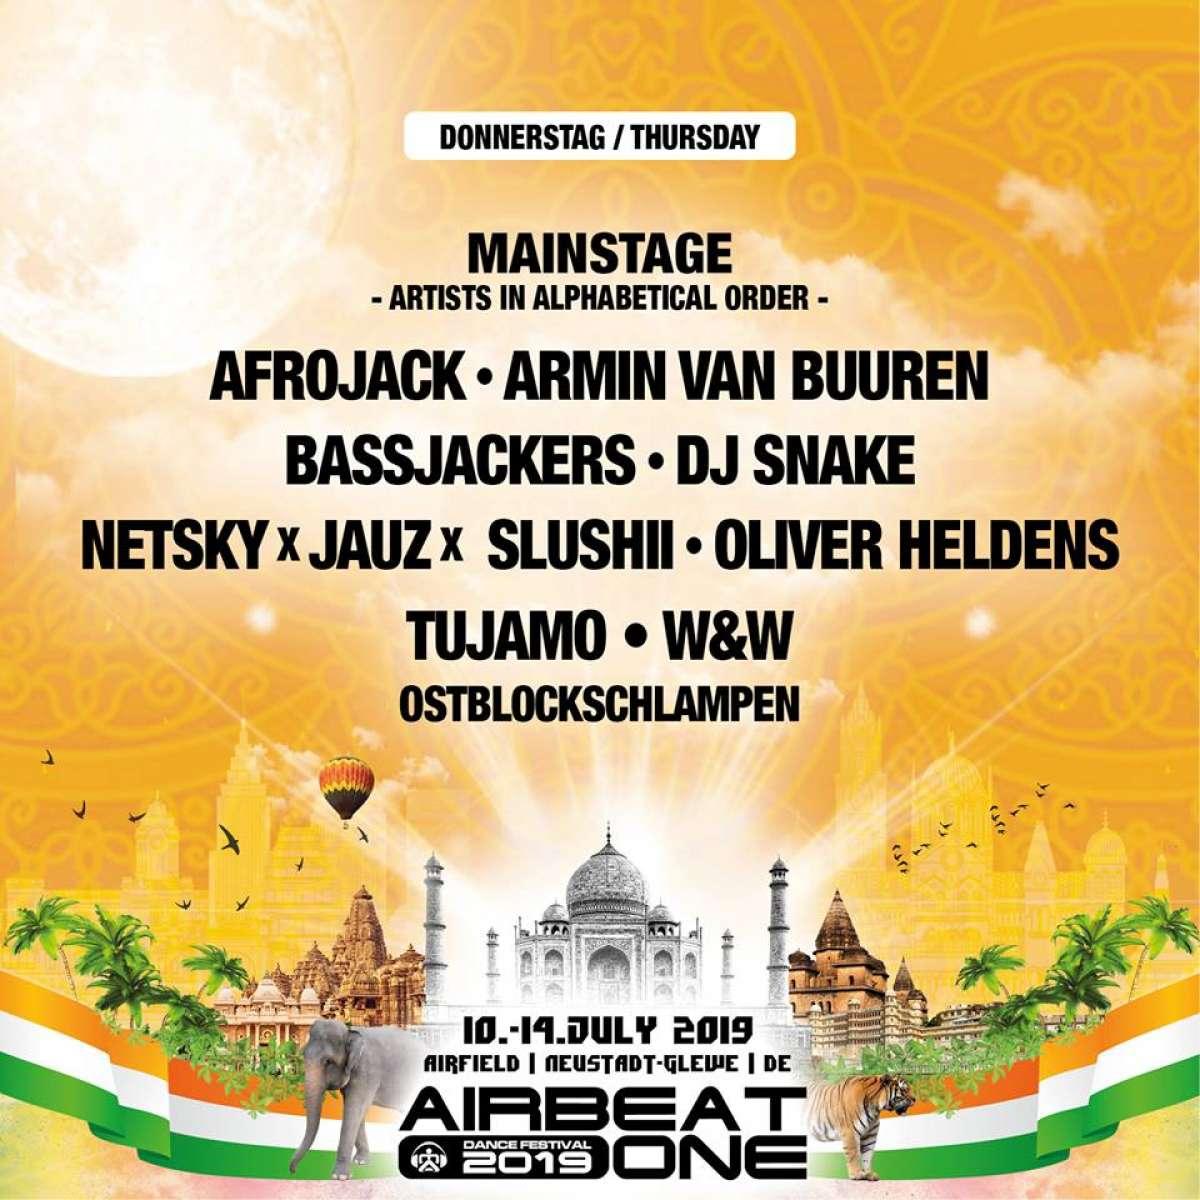 Airbeat One Festival - Armin van Buuren, Martin Garrix, Dimitri Vegas & Like Mike, Steve Aoki, The Chainsmokers, Afrojack - Festivalgelände  - Neustadt-Glewe